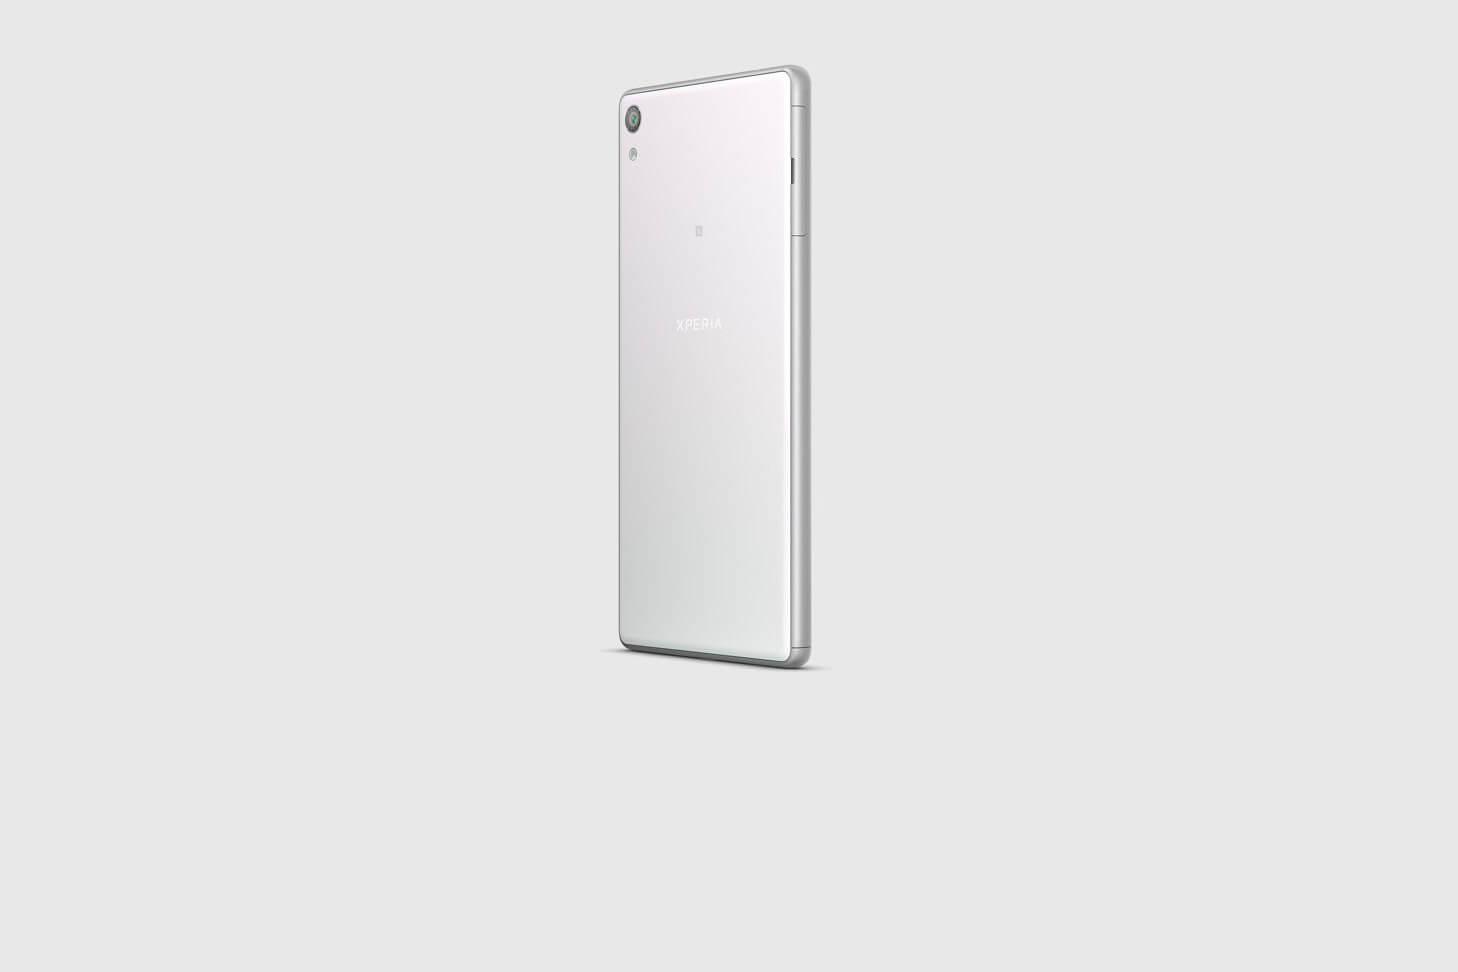 smt sony xperia xa ultra p04 - Sony apresenta Xperia XA Ultra, seu phablet bom de selfie